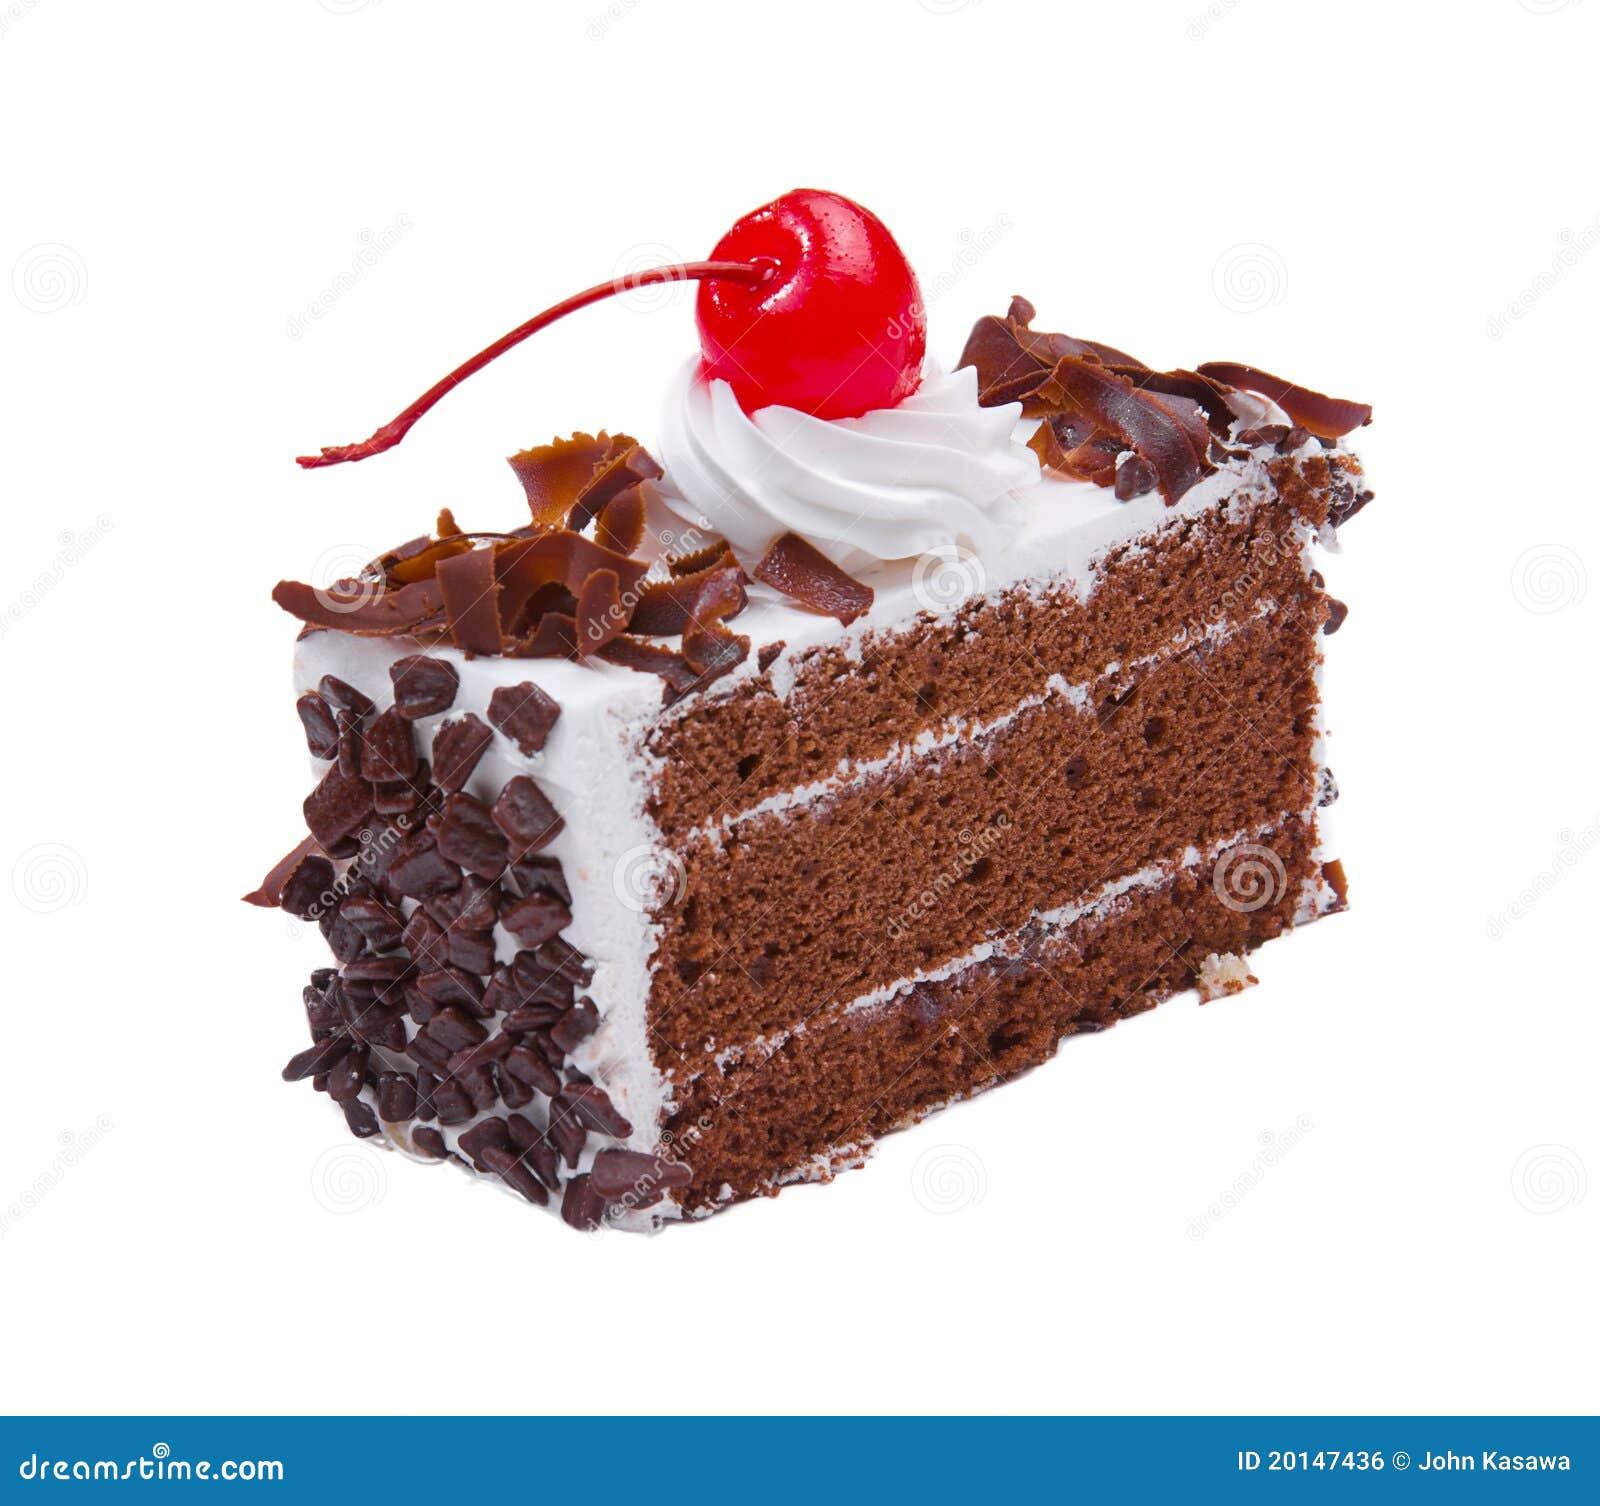 Fruit Cake With Sugar Topping